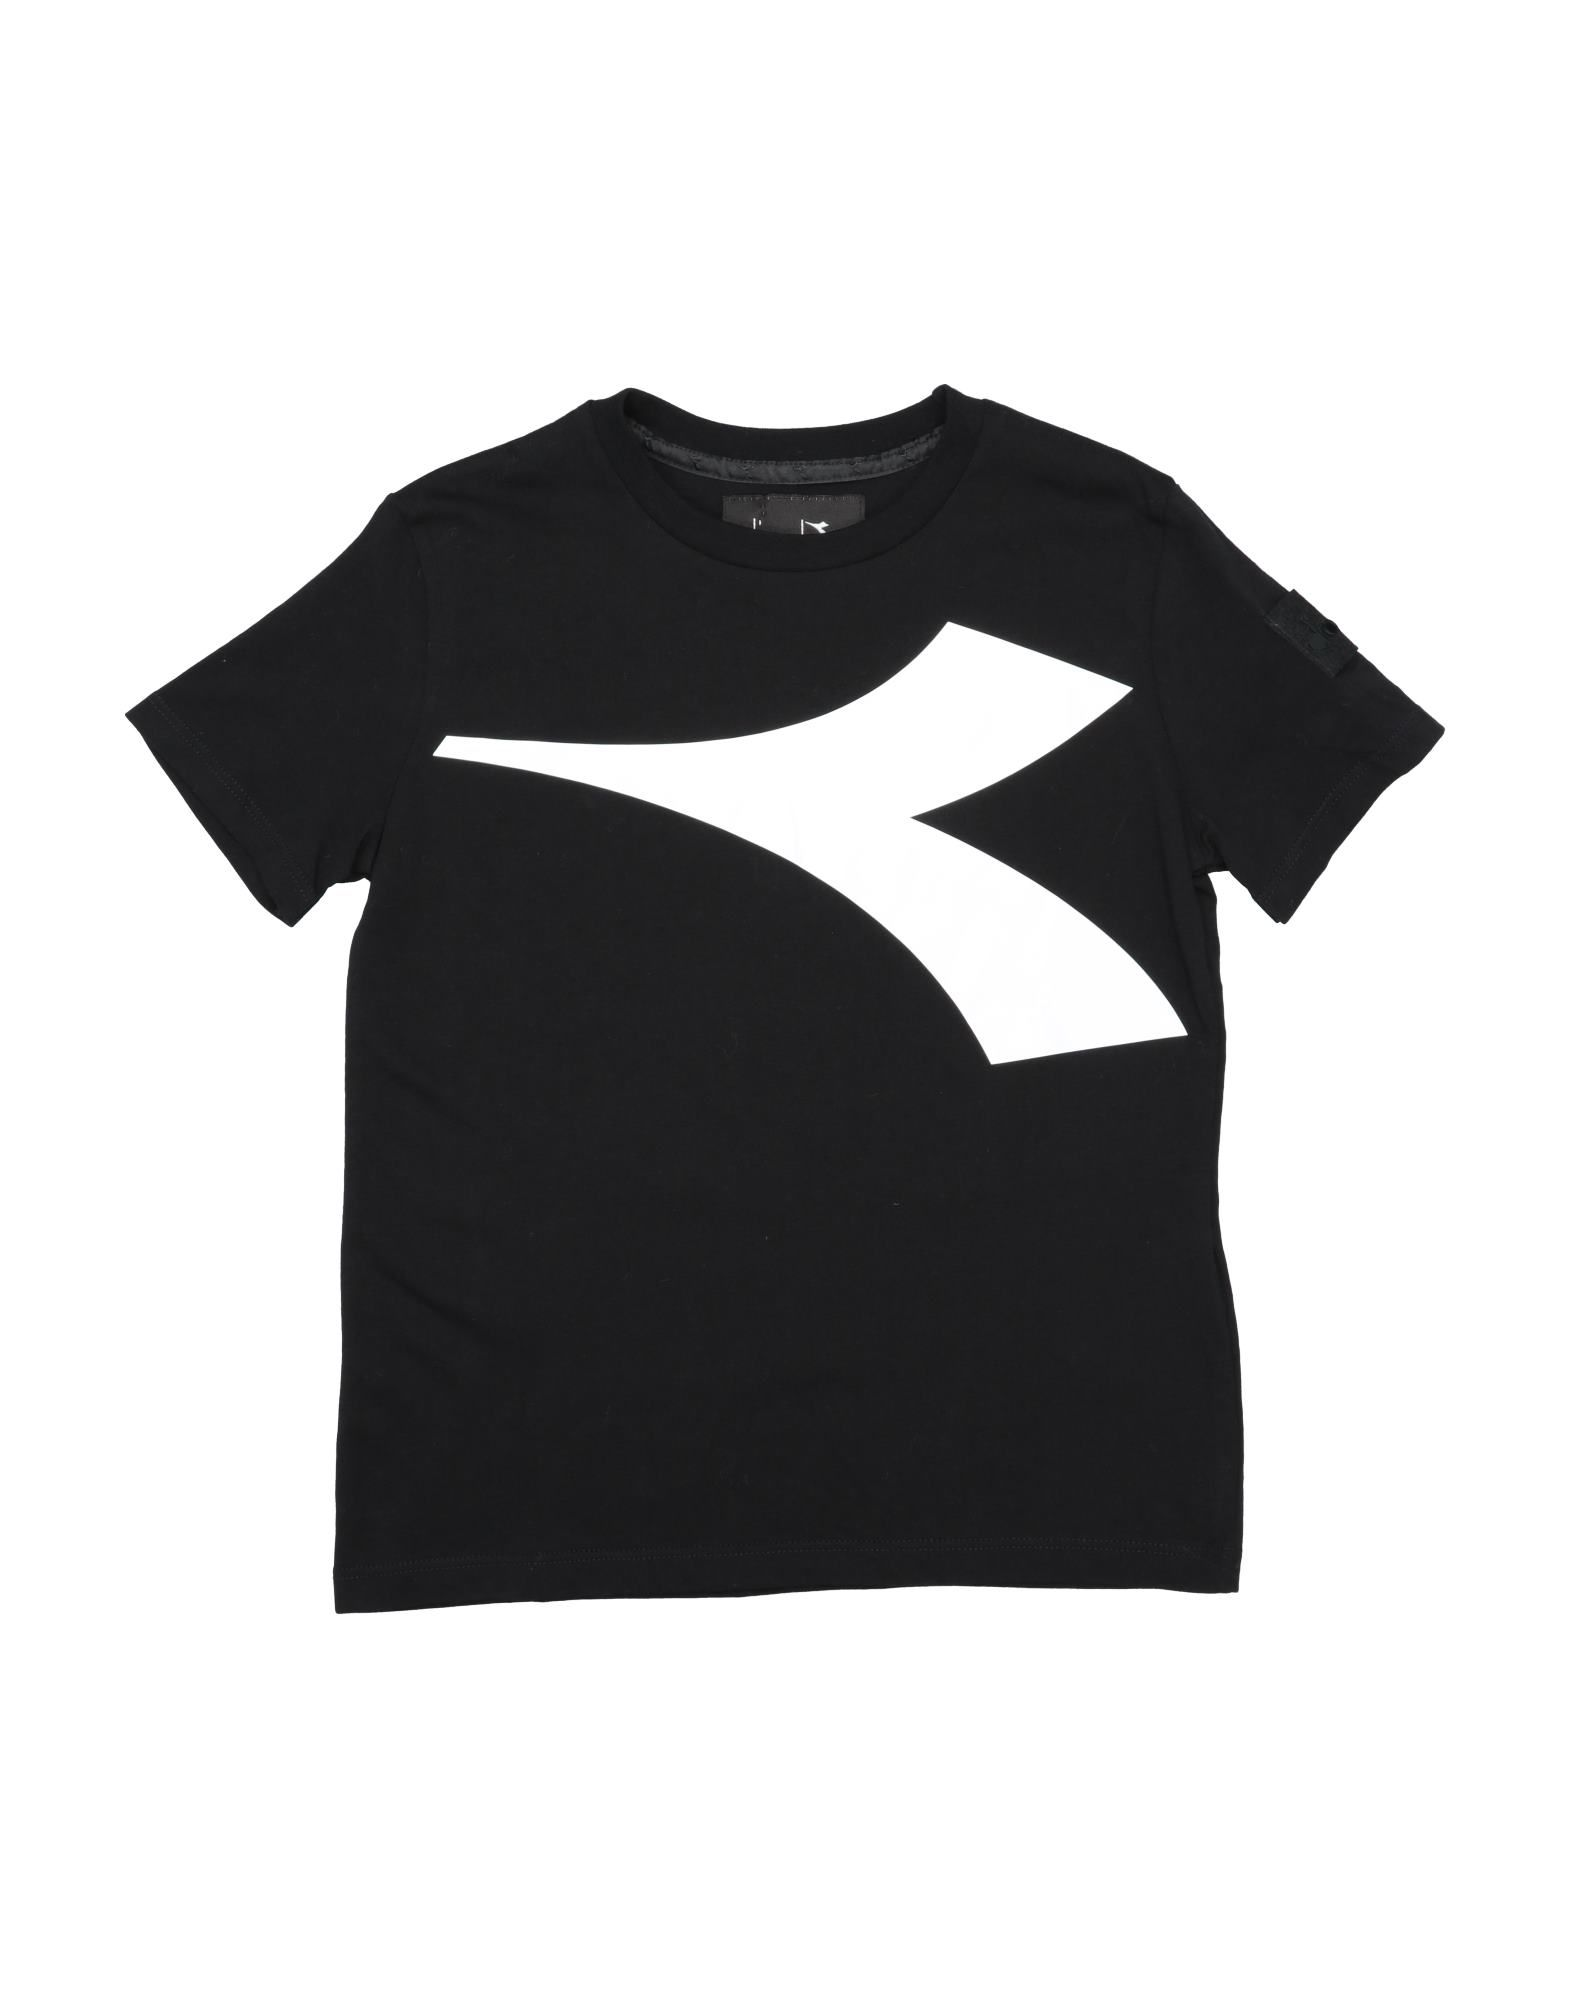 Diadora Kids' T-shirts In Black